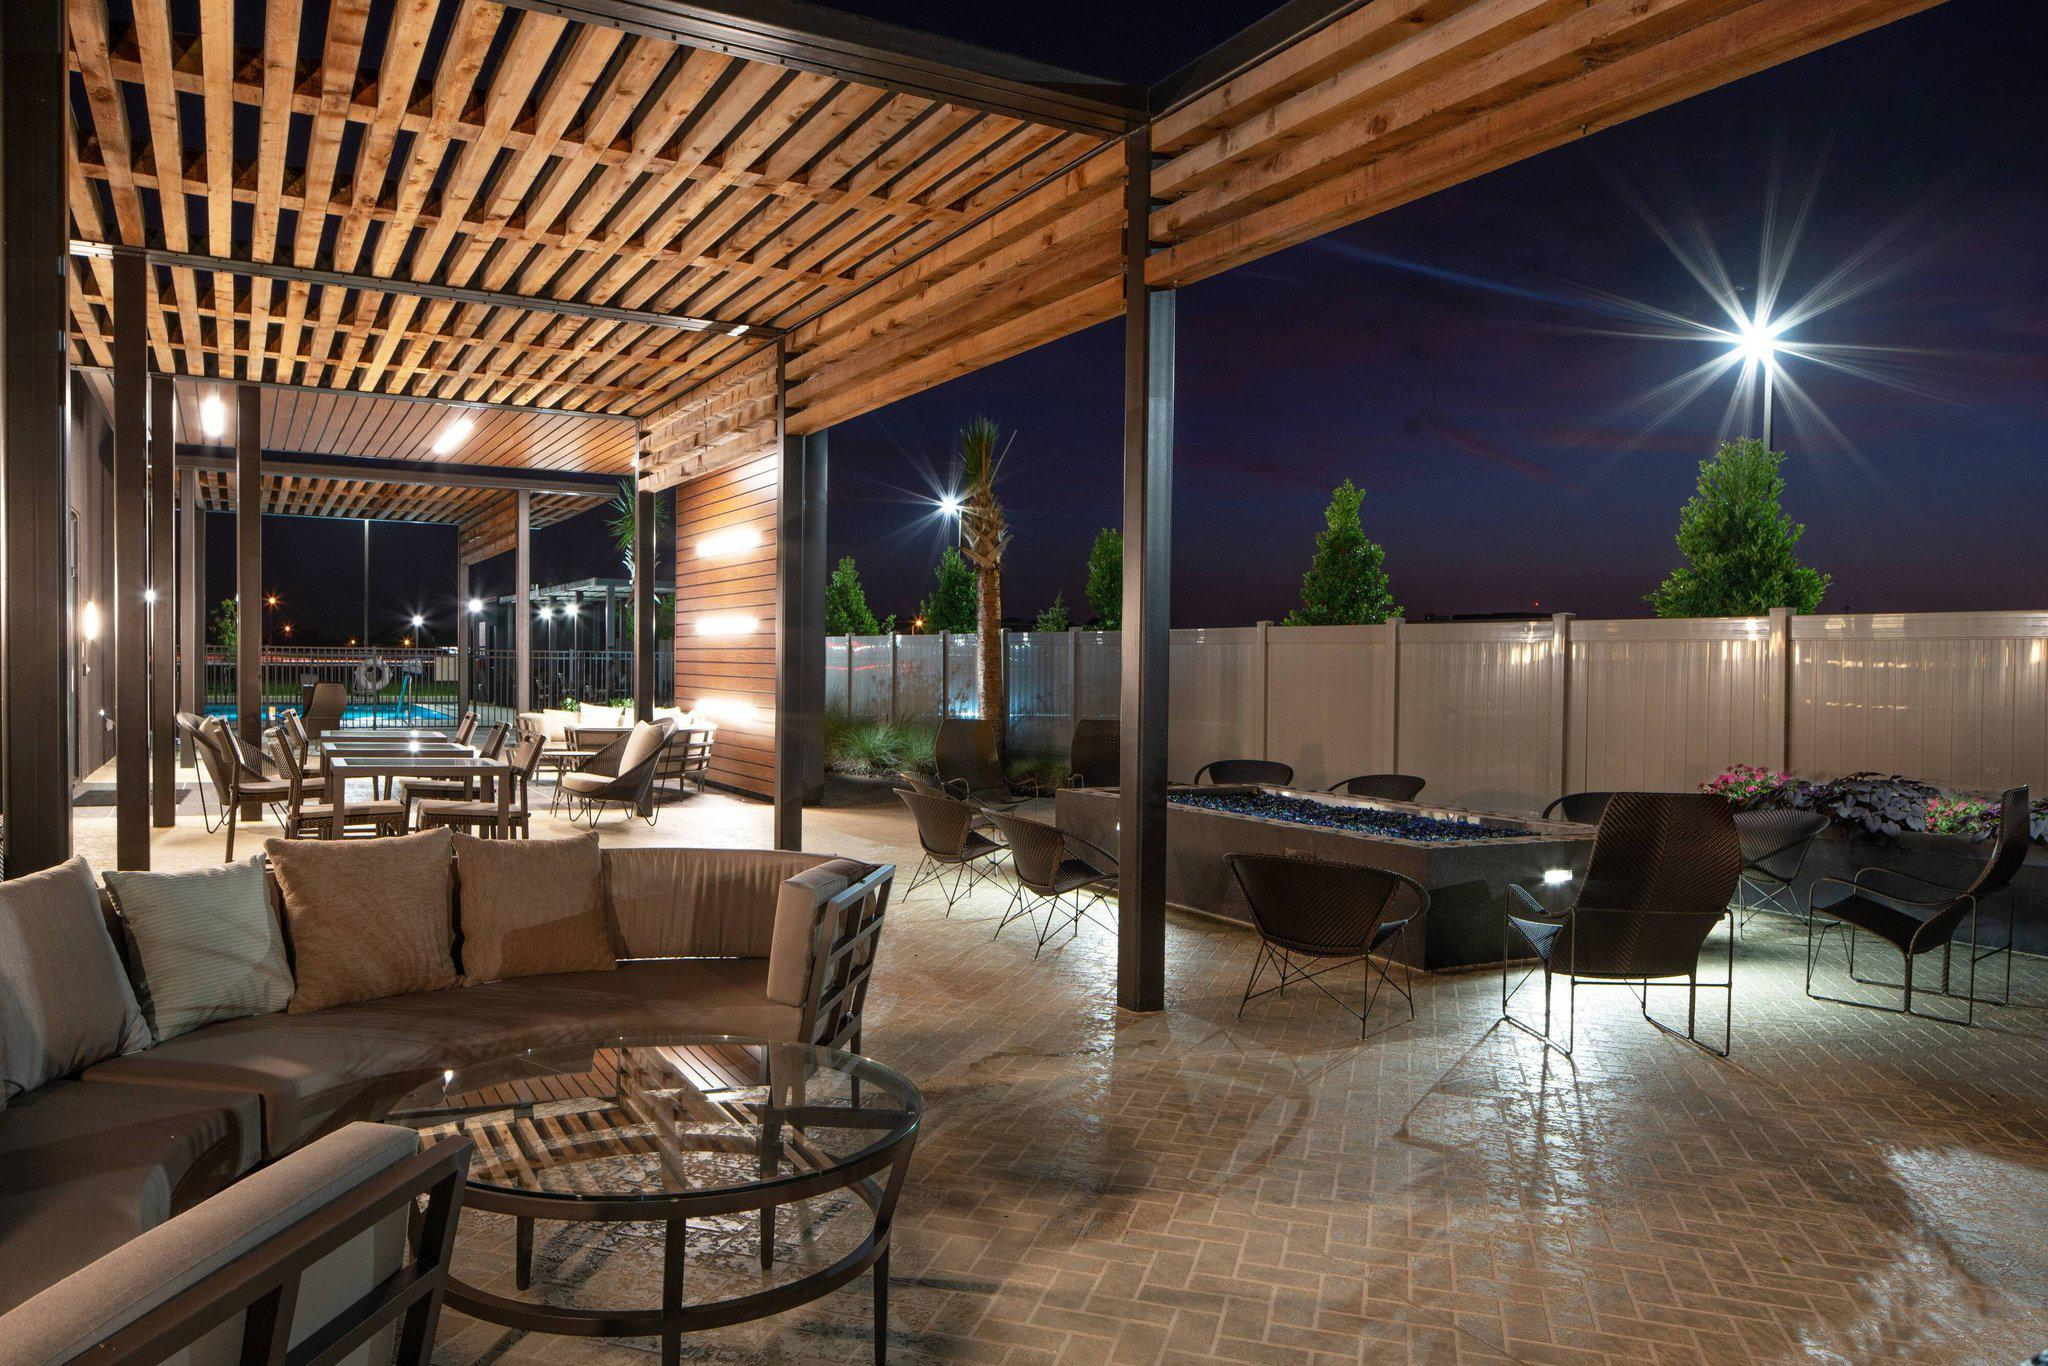 Courtyard by Marriott Lafayette South